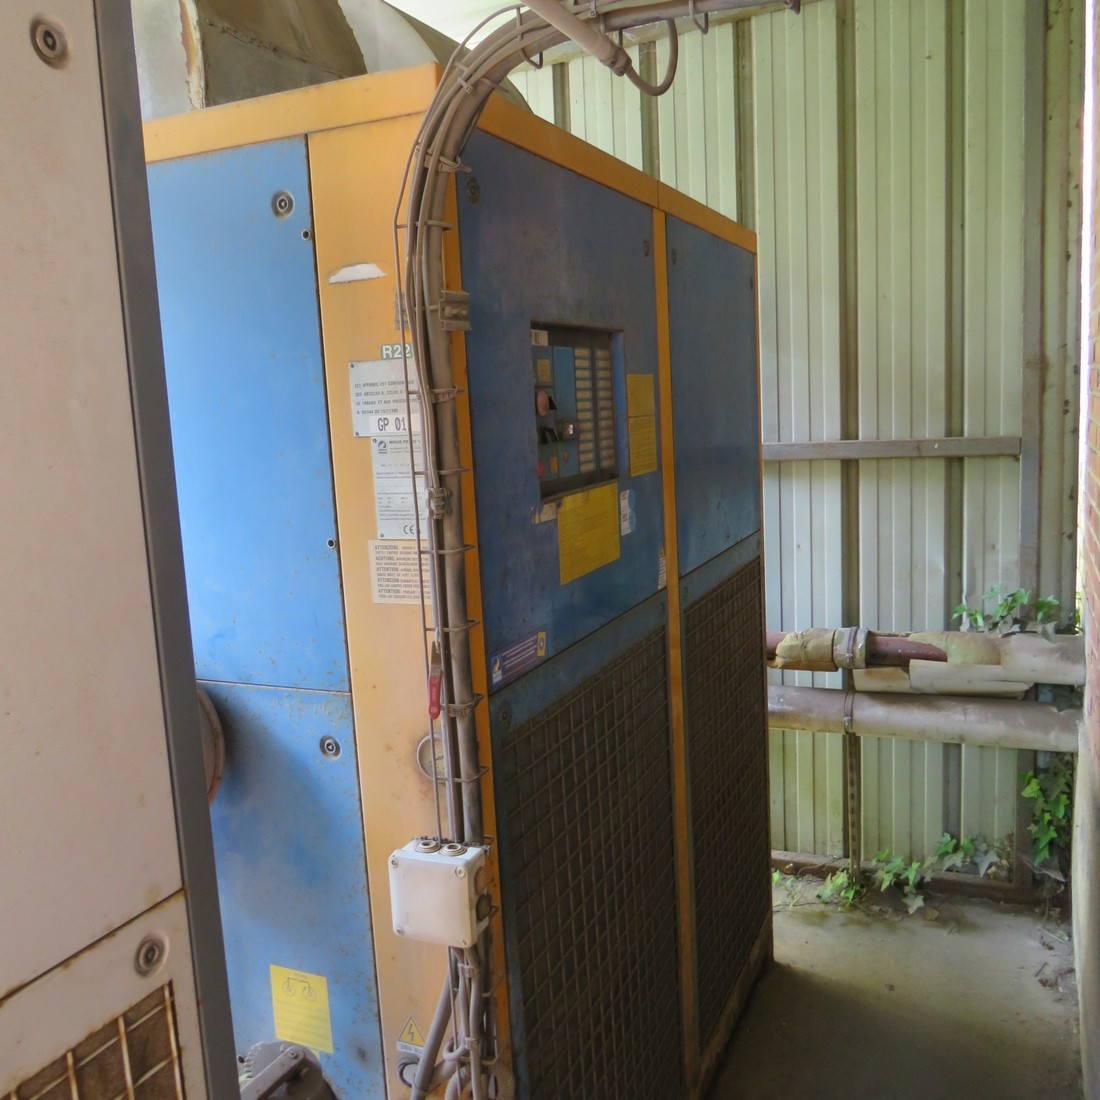 R1P729 NOVA FRIGO refrigeration unit - R45 Type - visible by appointment